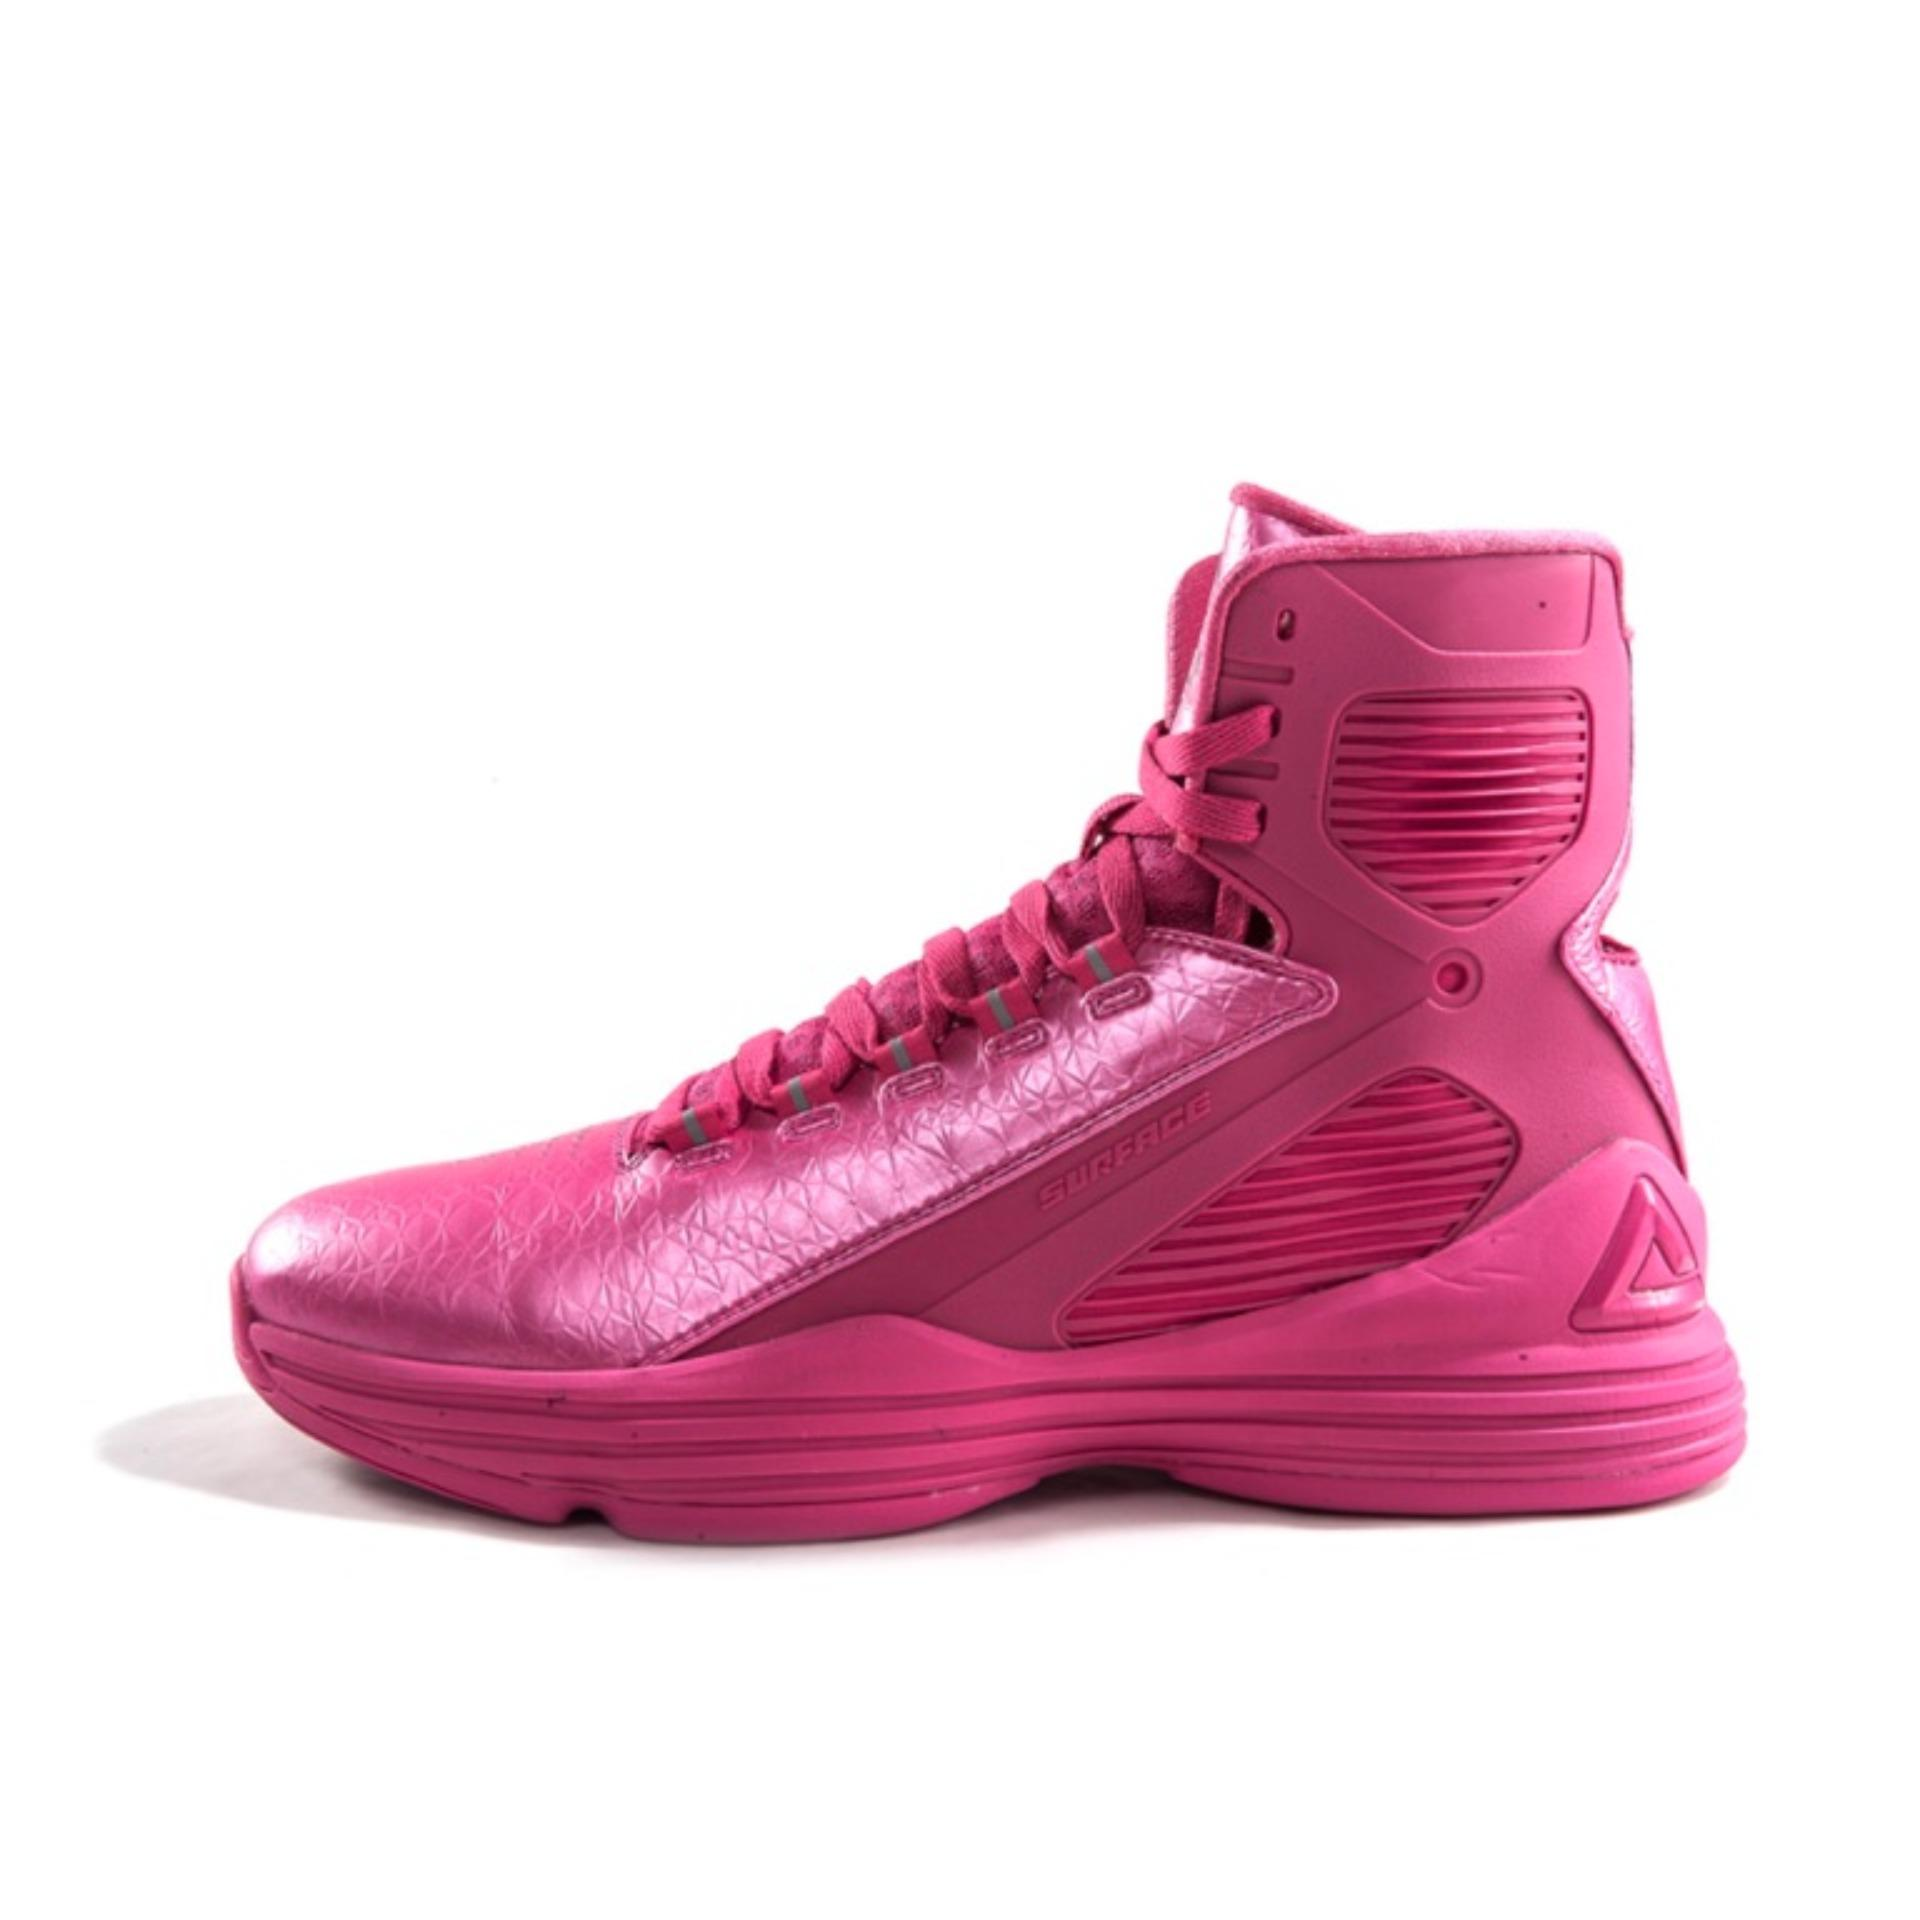 Sepatu Basket Peak E51301a George Hill Edition Hitam Daftar Harga Tony Parker9 Ii E44323a Blue Red E51001a Galaxy Pink